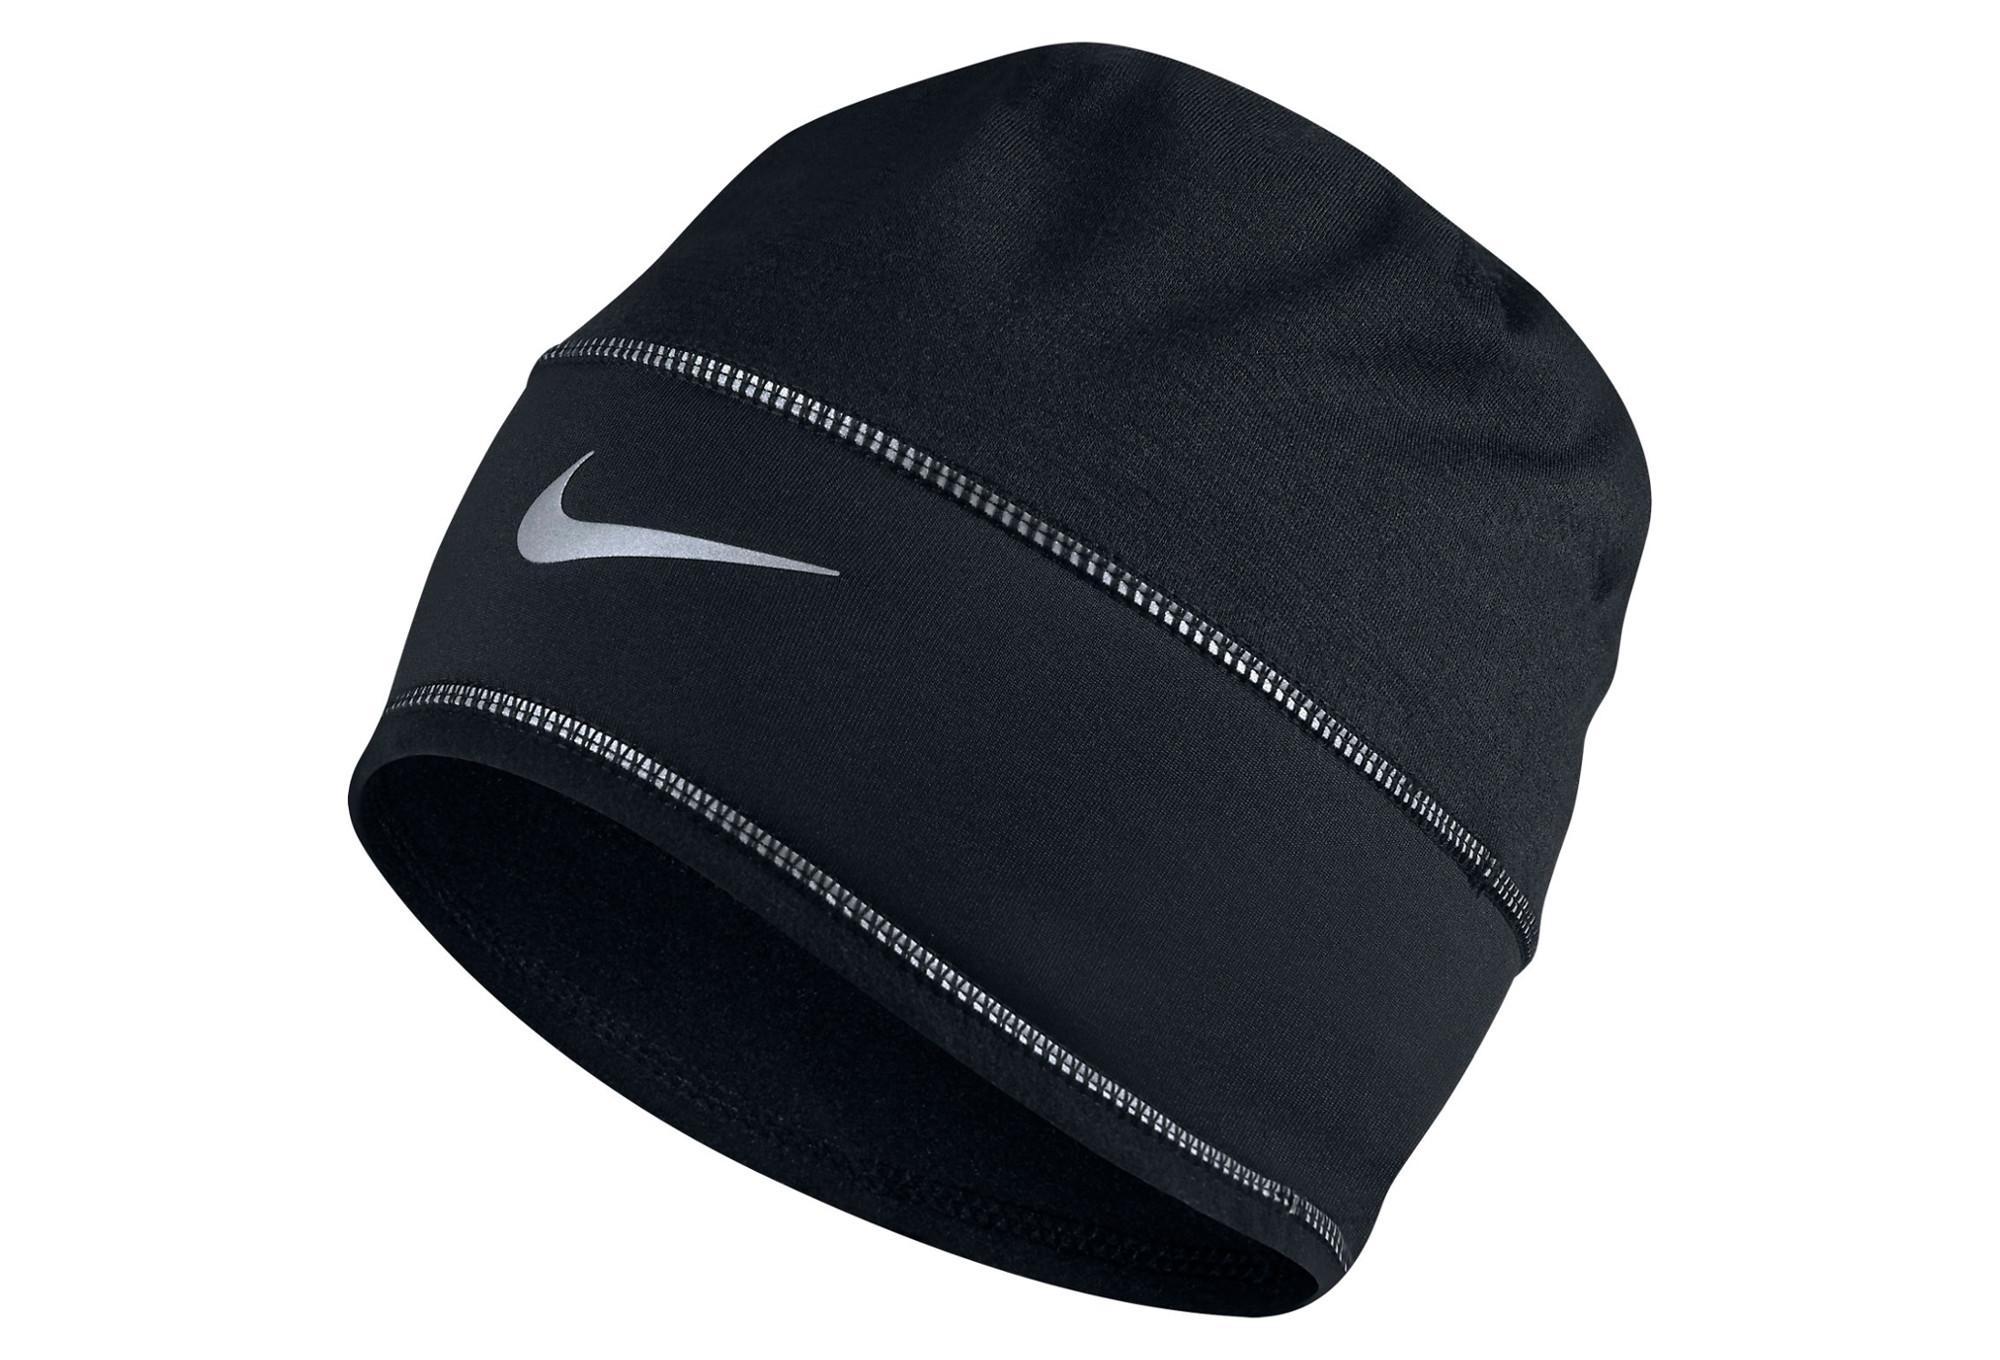 Nike Dry Flash Beanie Black Unisex  2a6ab0d5a55